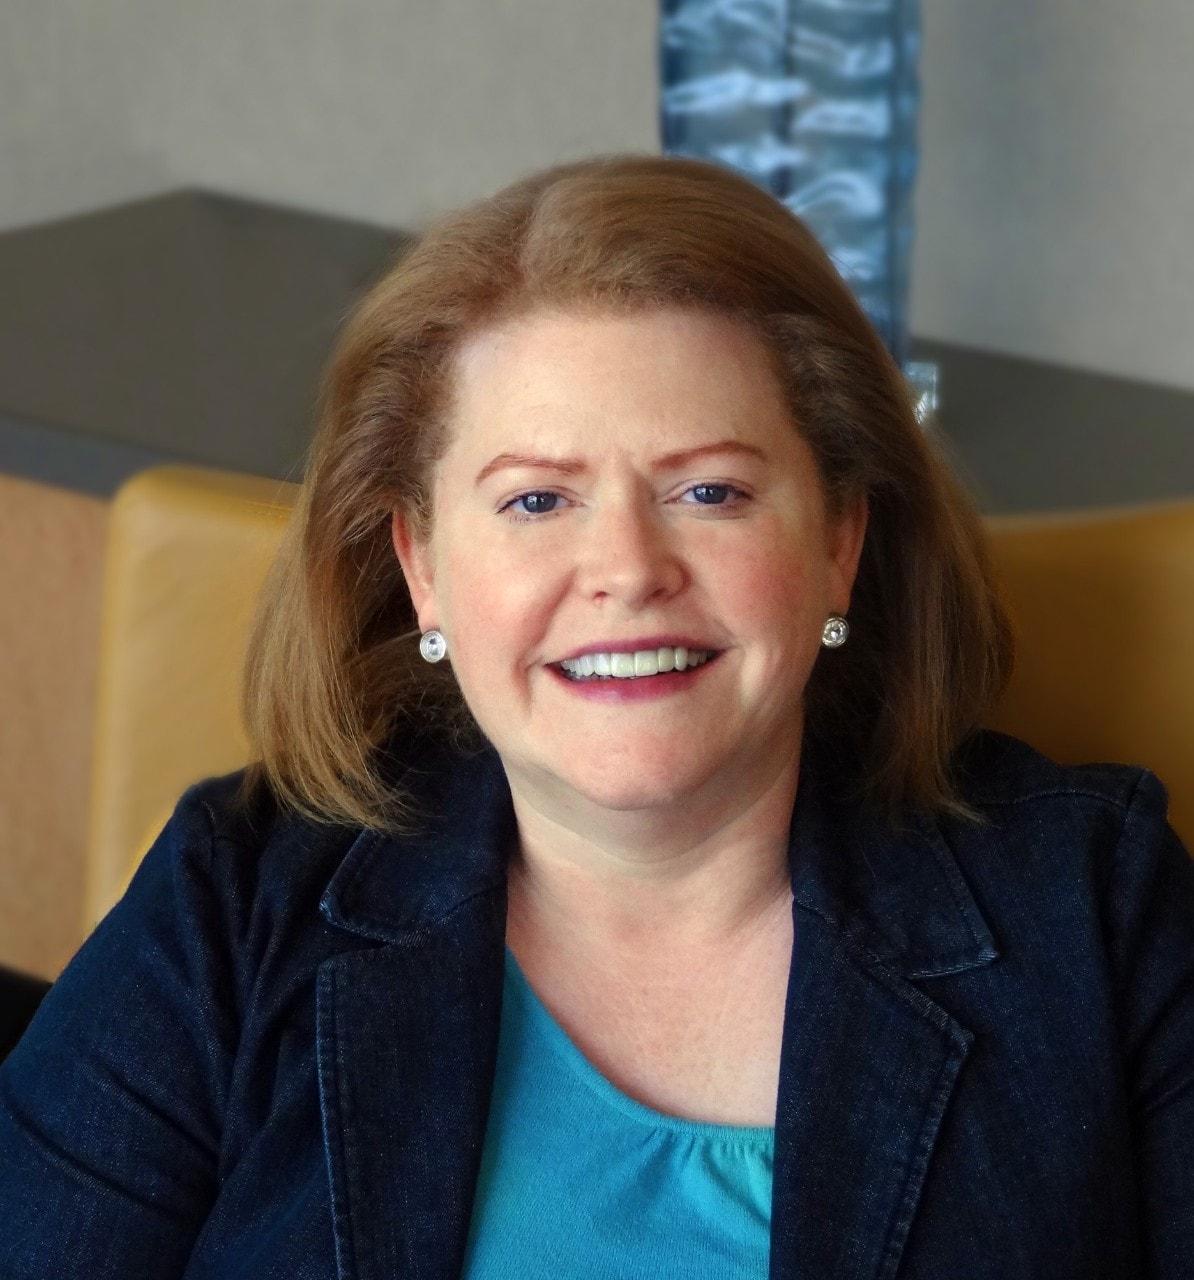 Susan Weidner, cancer survivor and Senior VP IntrinsiQ Specialty Solutions